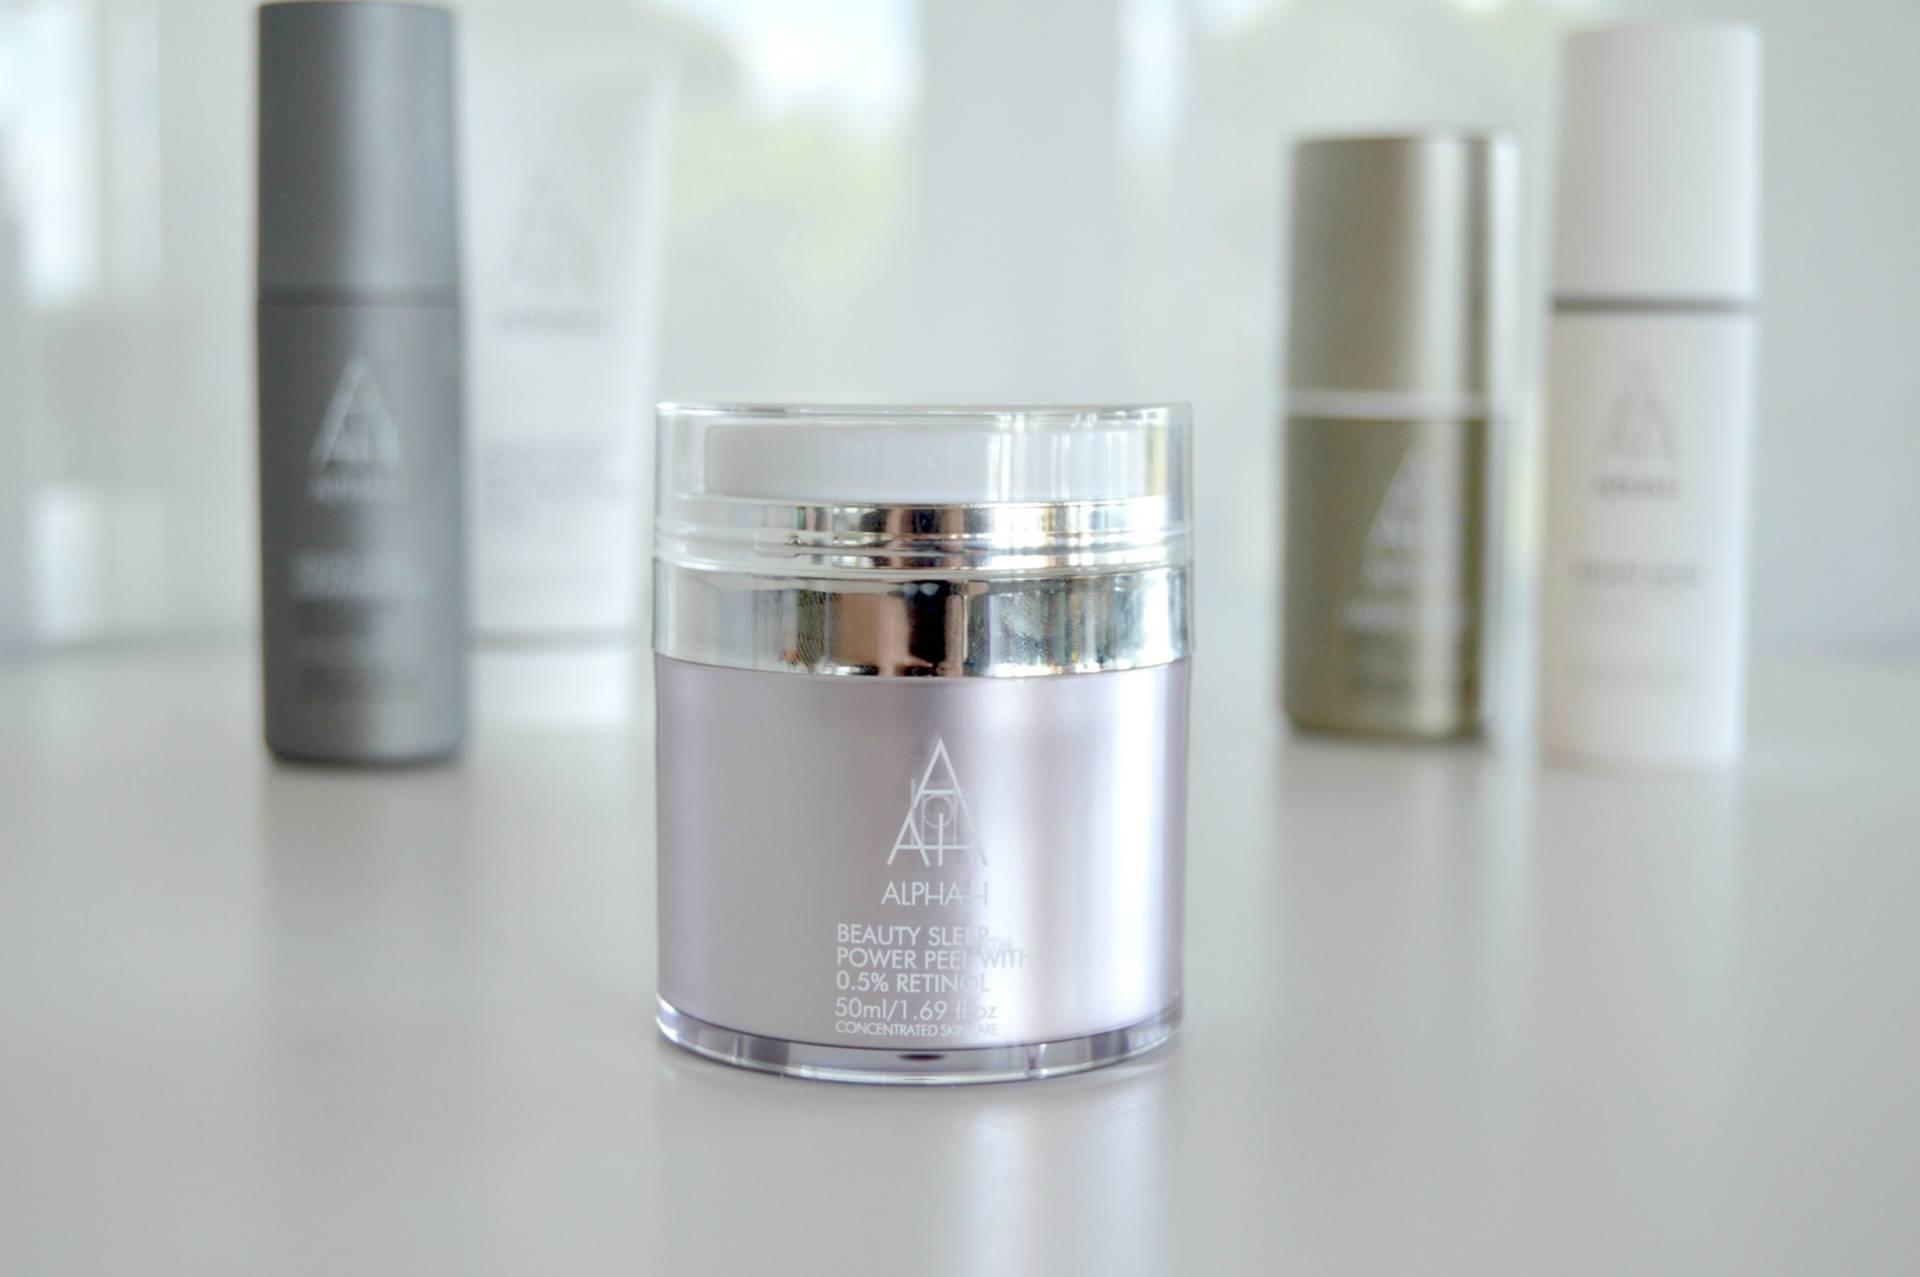 alpha h power peel retinol glycolic beauty sleep review inhautepursuit